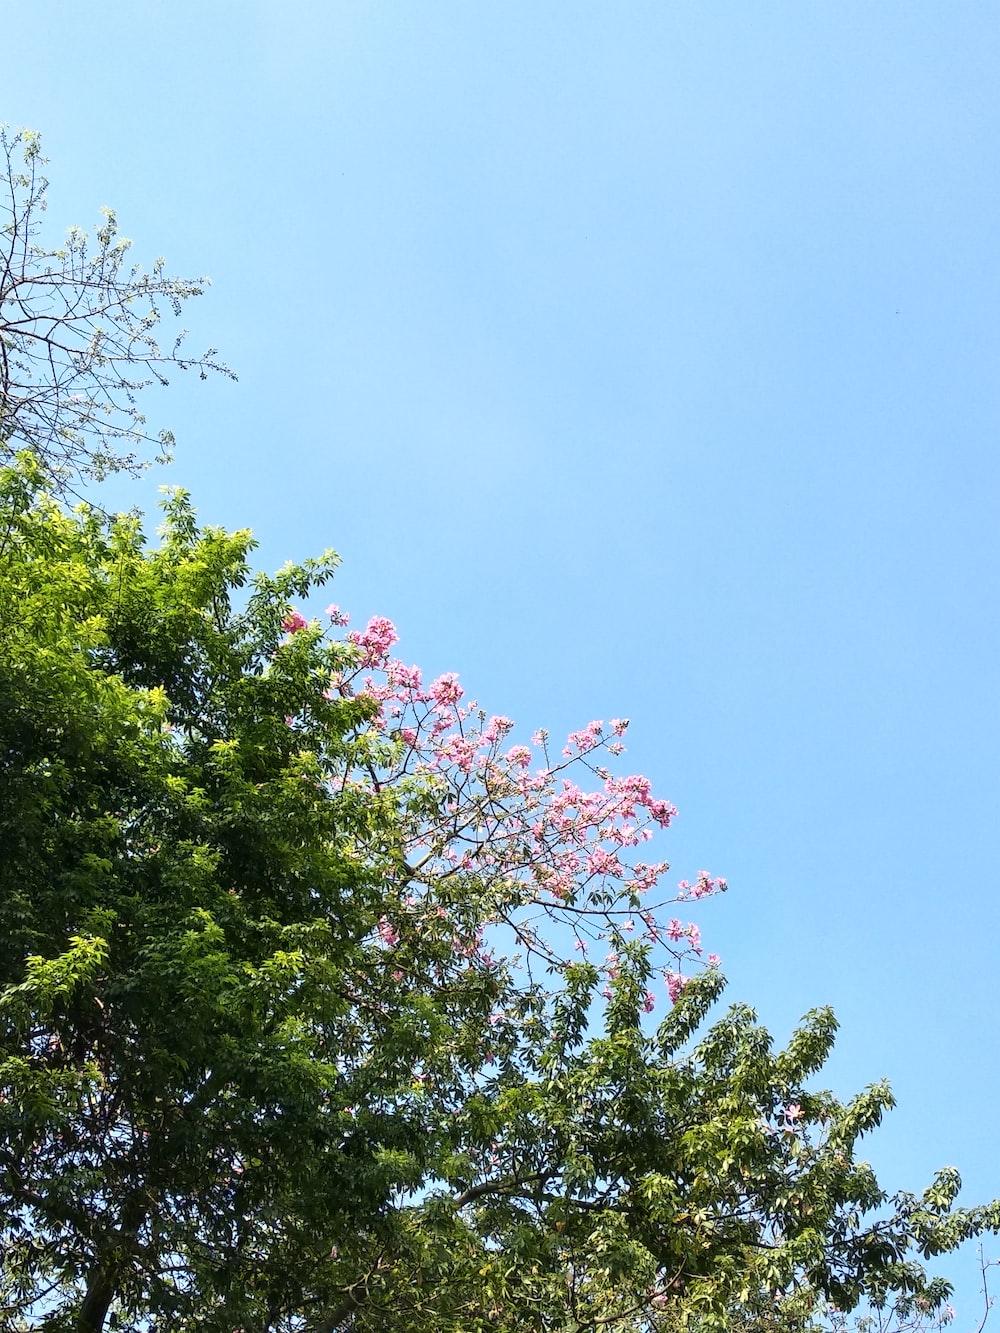 green-leafed pink-petaled flowering tree under calm blue sky